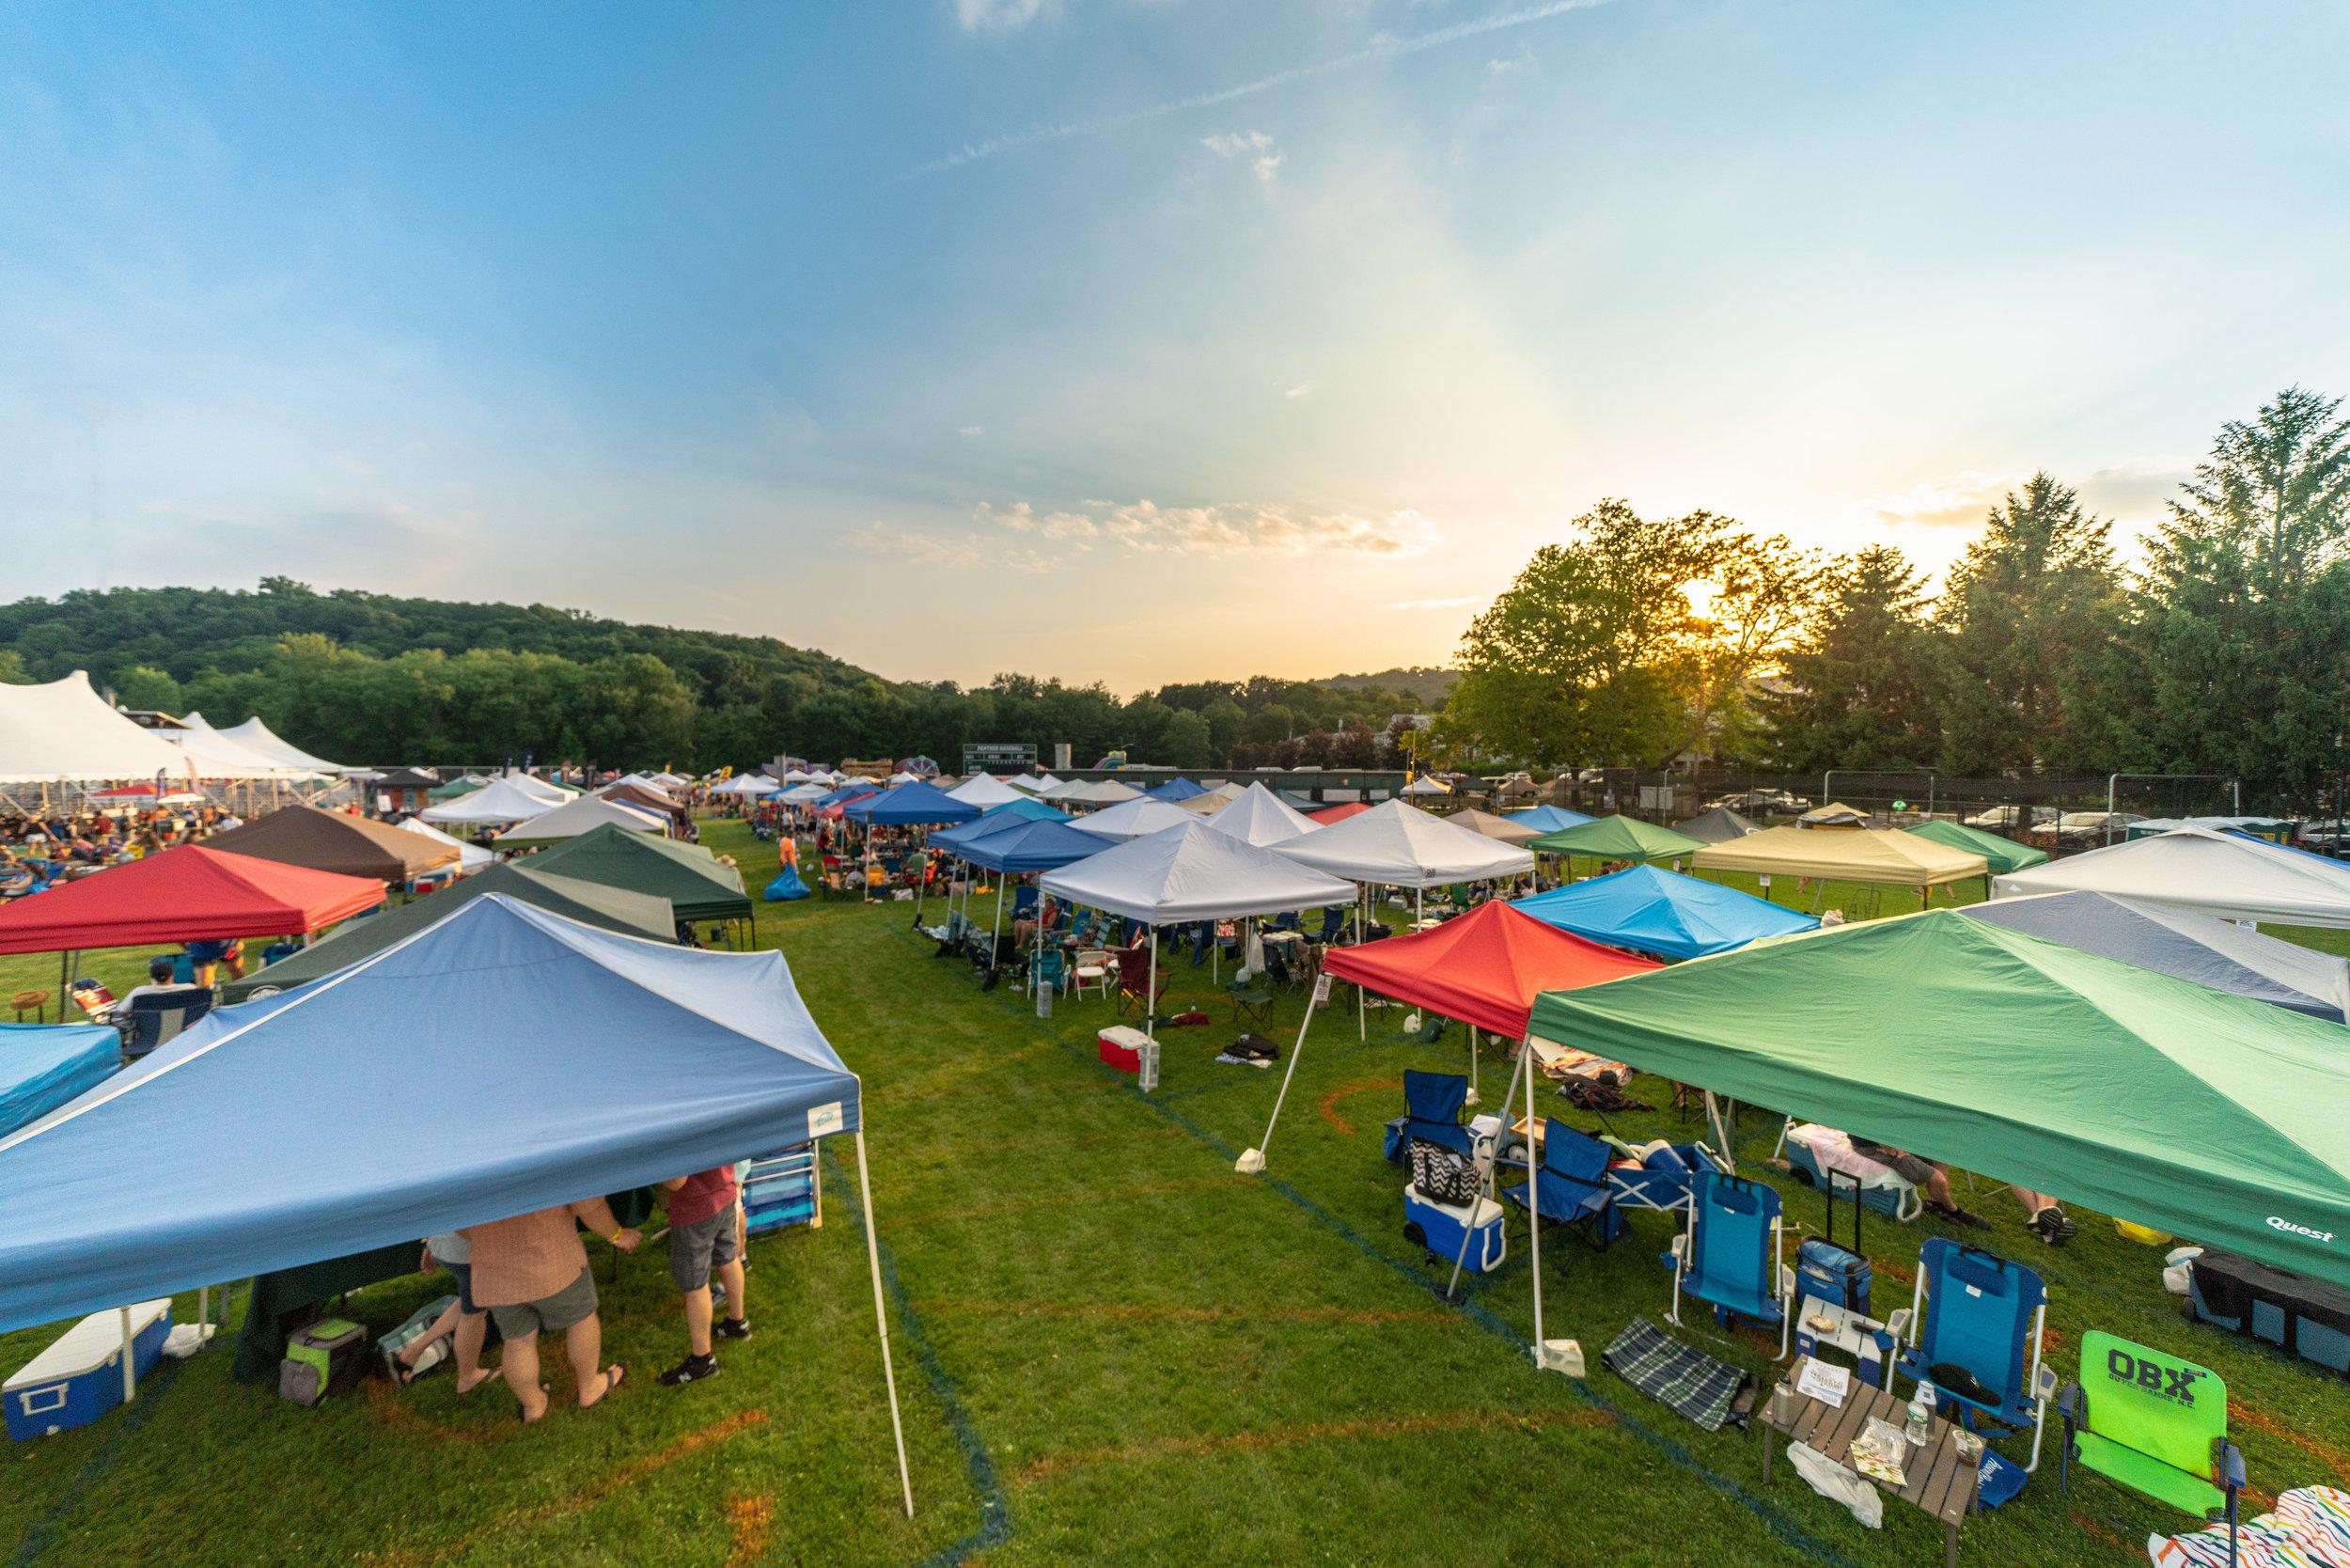 Tent City lookin' good © 2018 Jonathan Cunningham